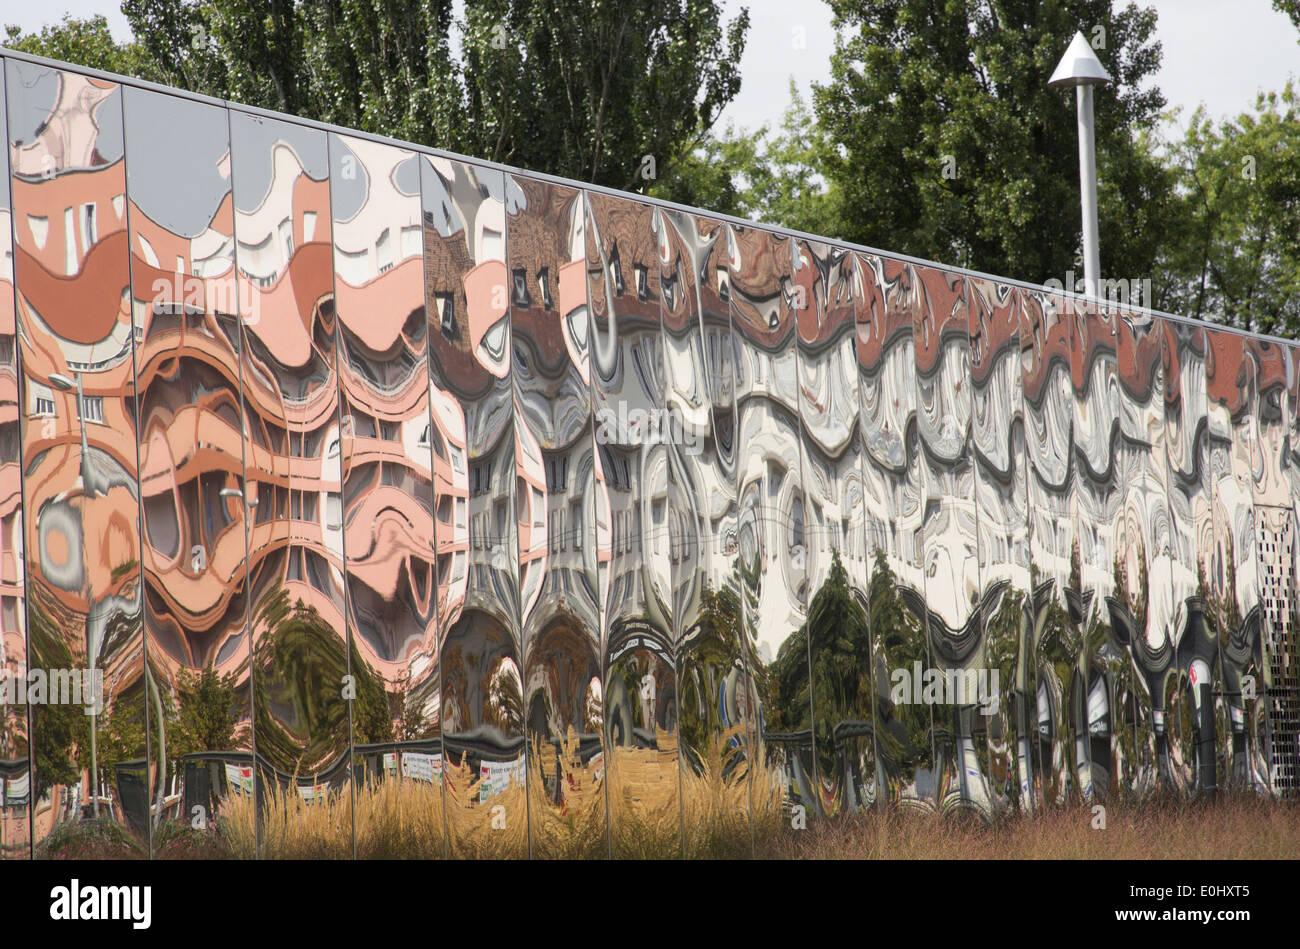 Museum in Strasbourg France - Stock Image